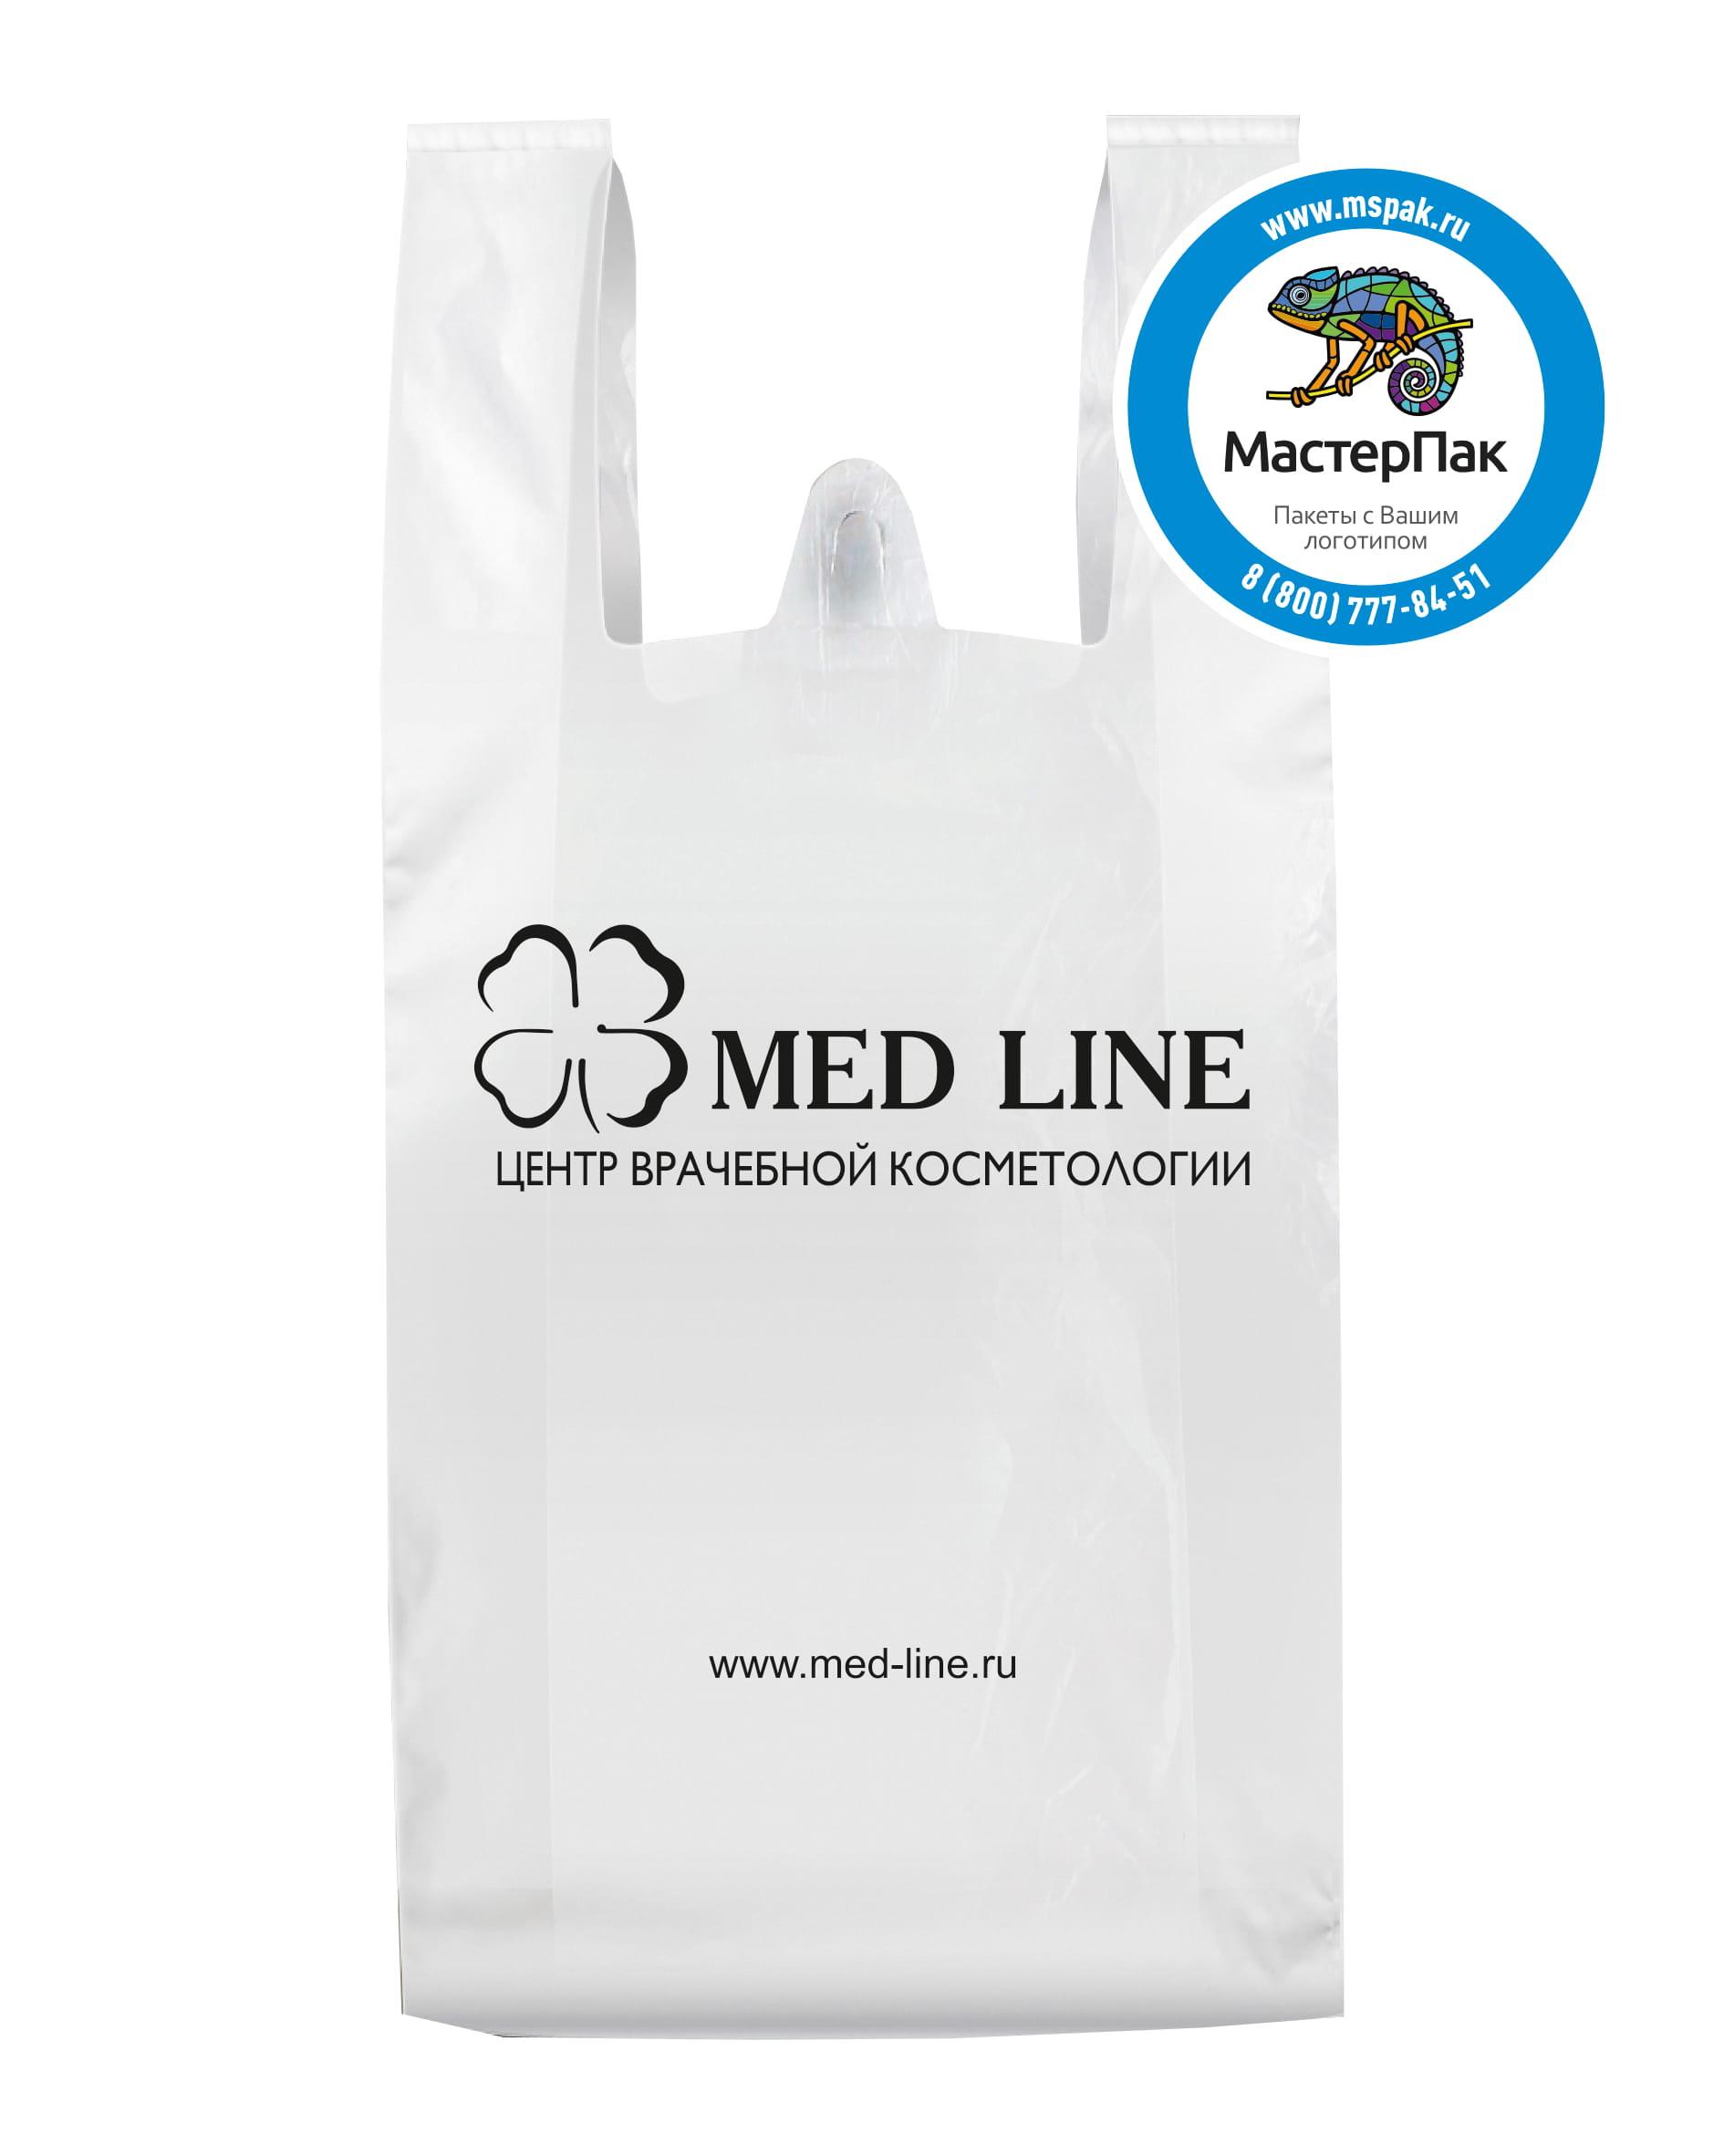 Пакет-майка ПНД с логотипом Med Line, Комсомольск-на-Амуре, 40*60, 28 мкм